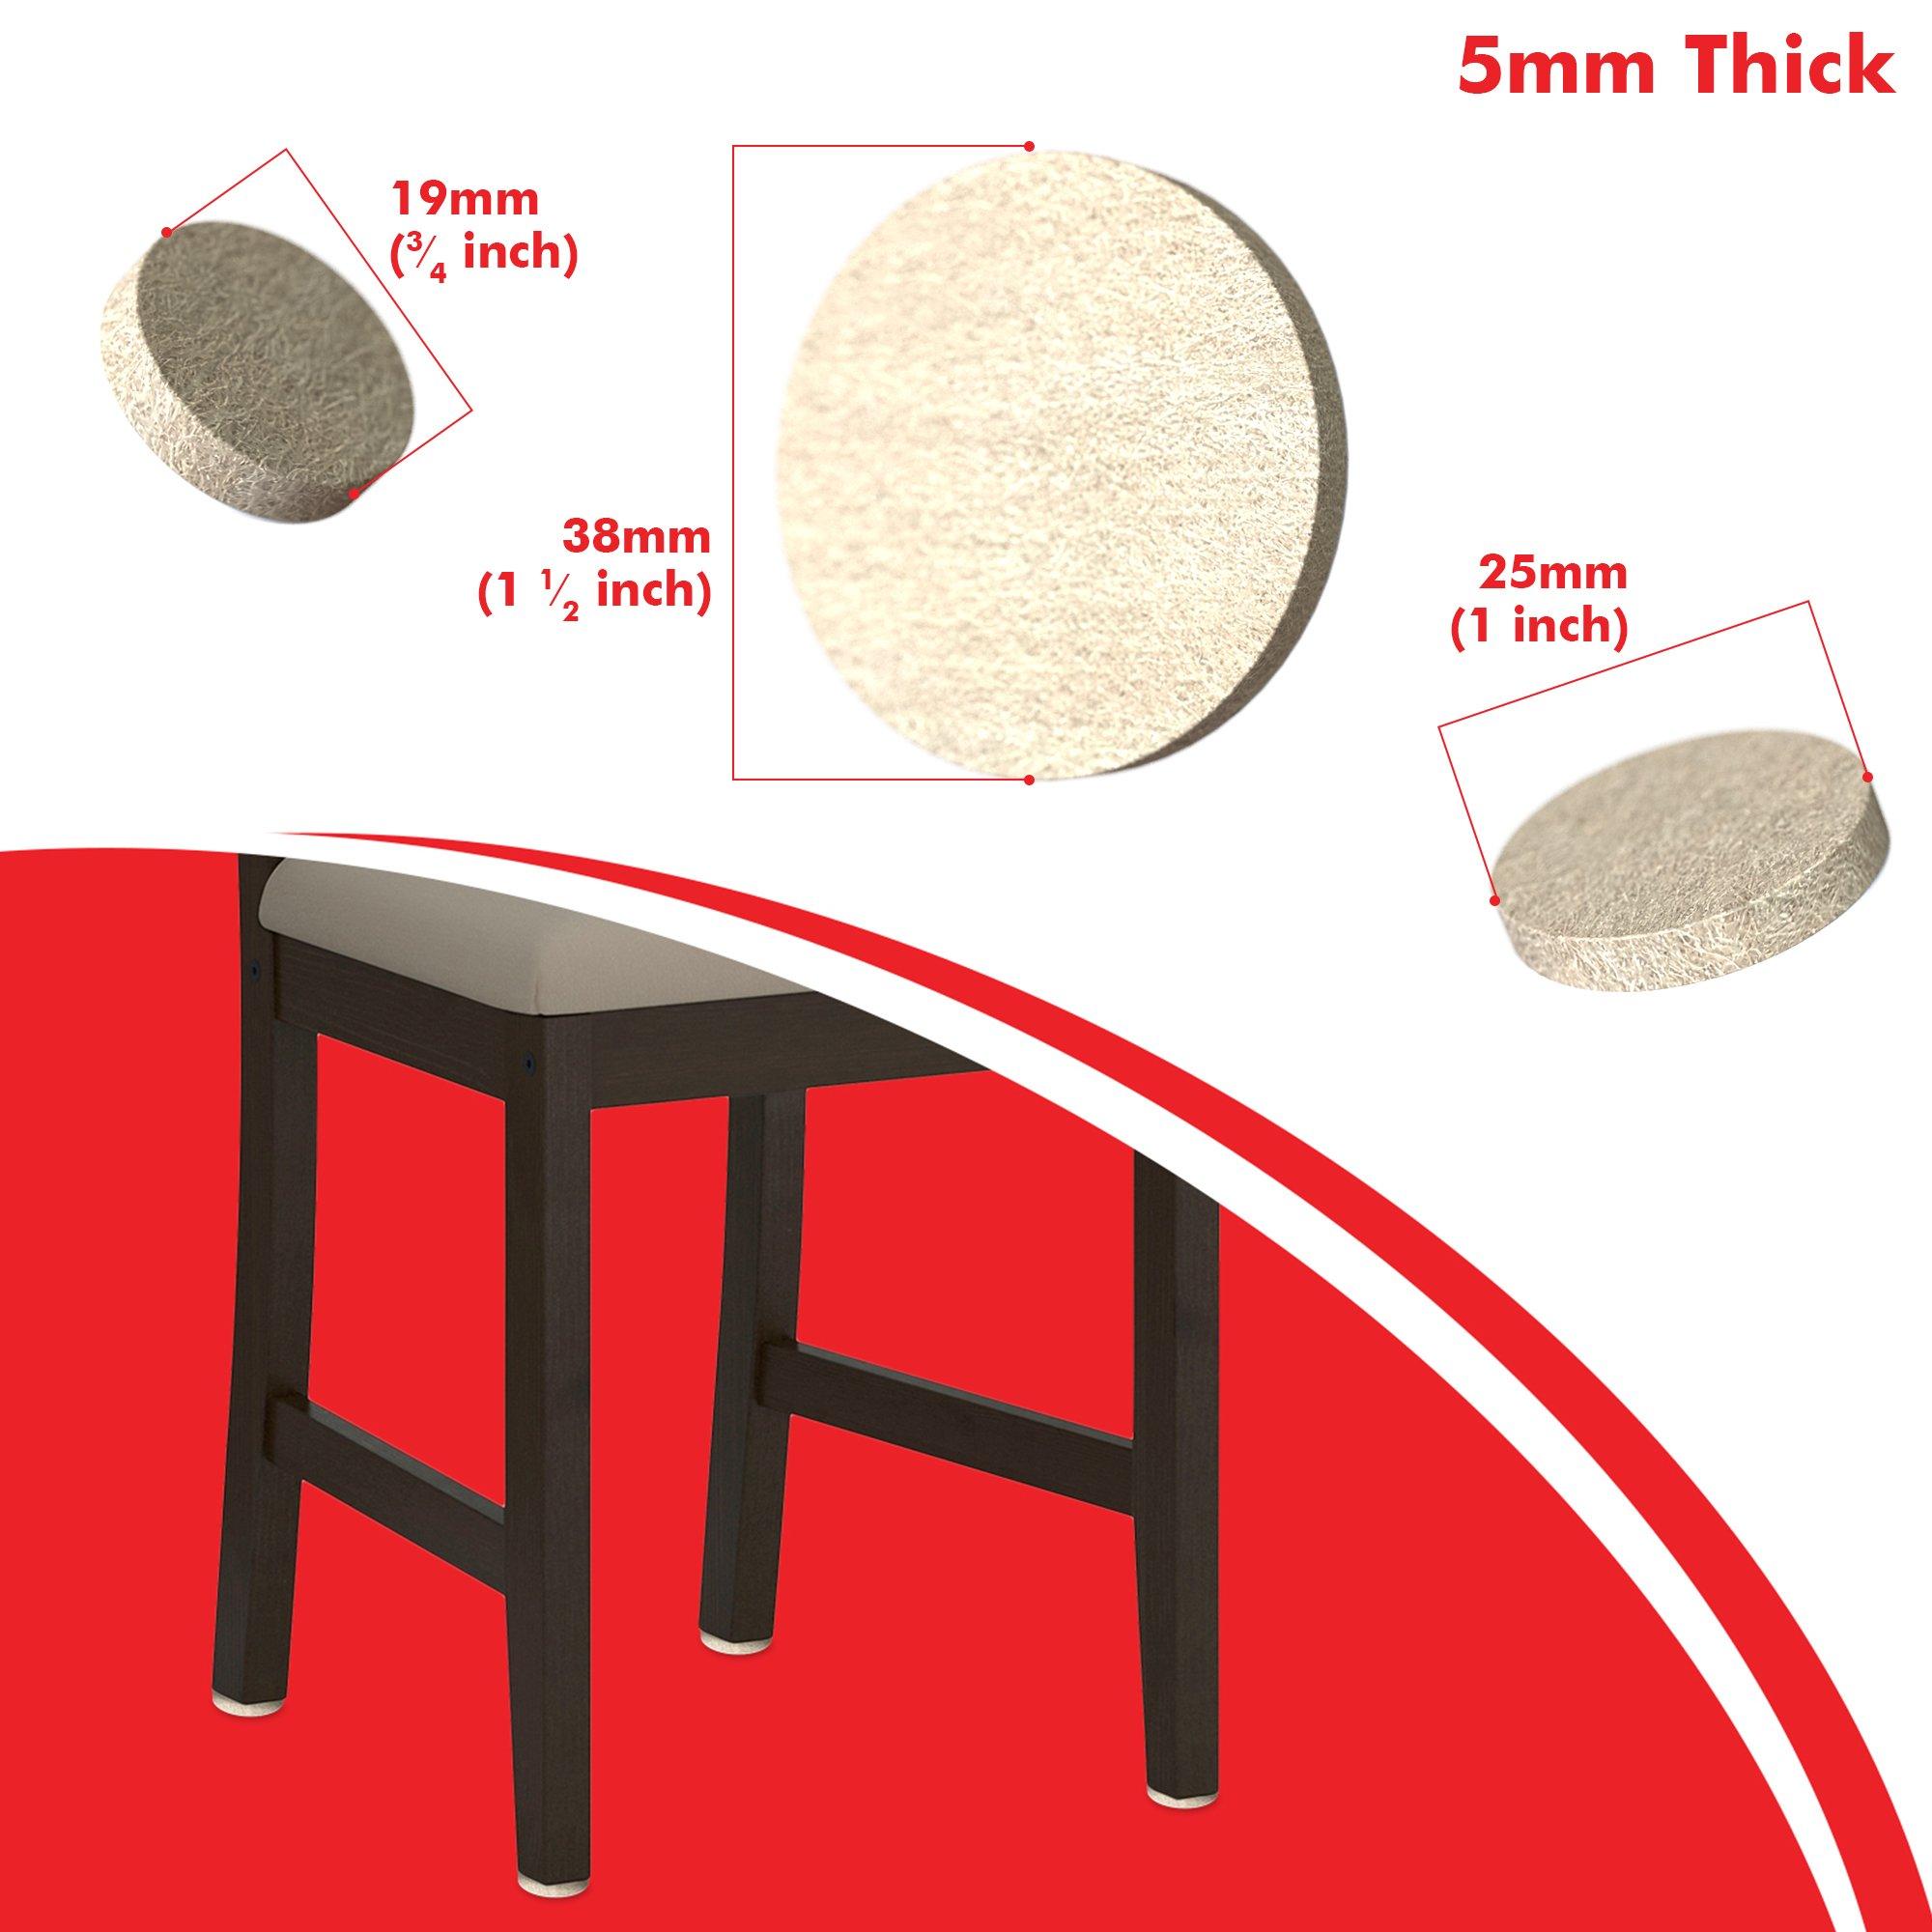 Simala Premium Furniture Pads 124 Pack 60 Heavy Duty Self